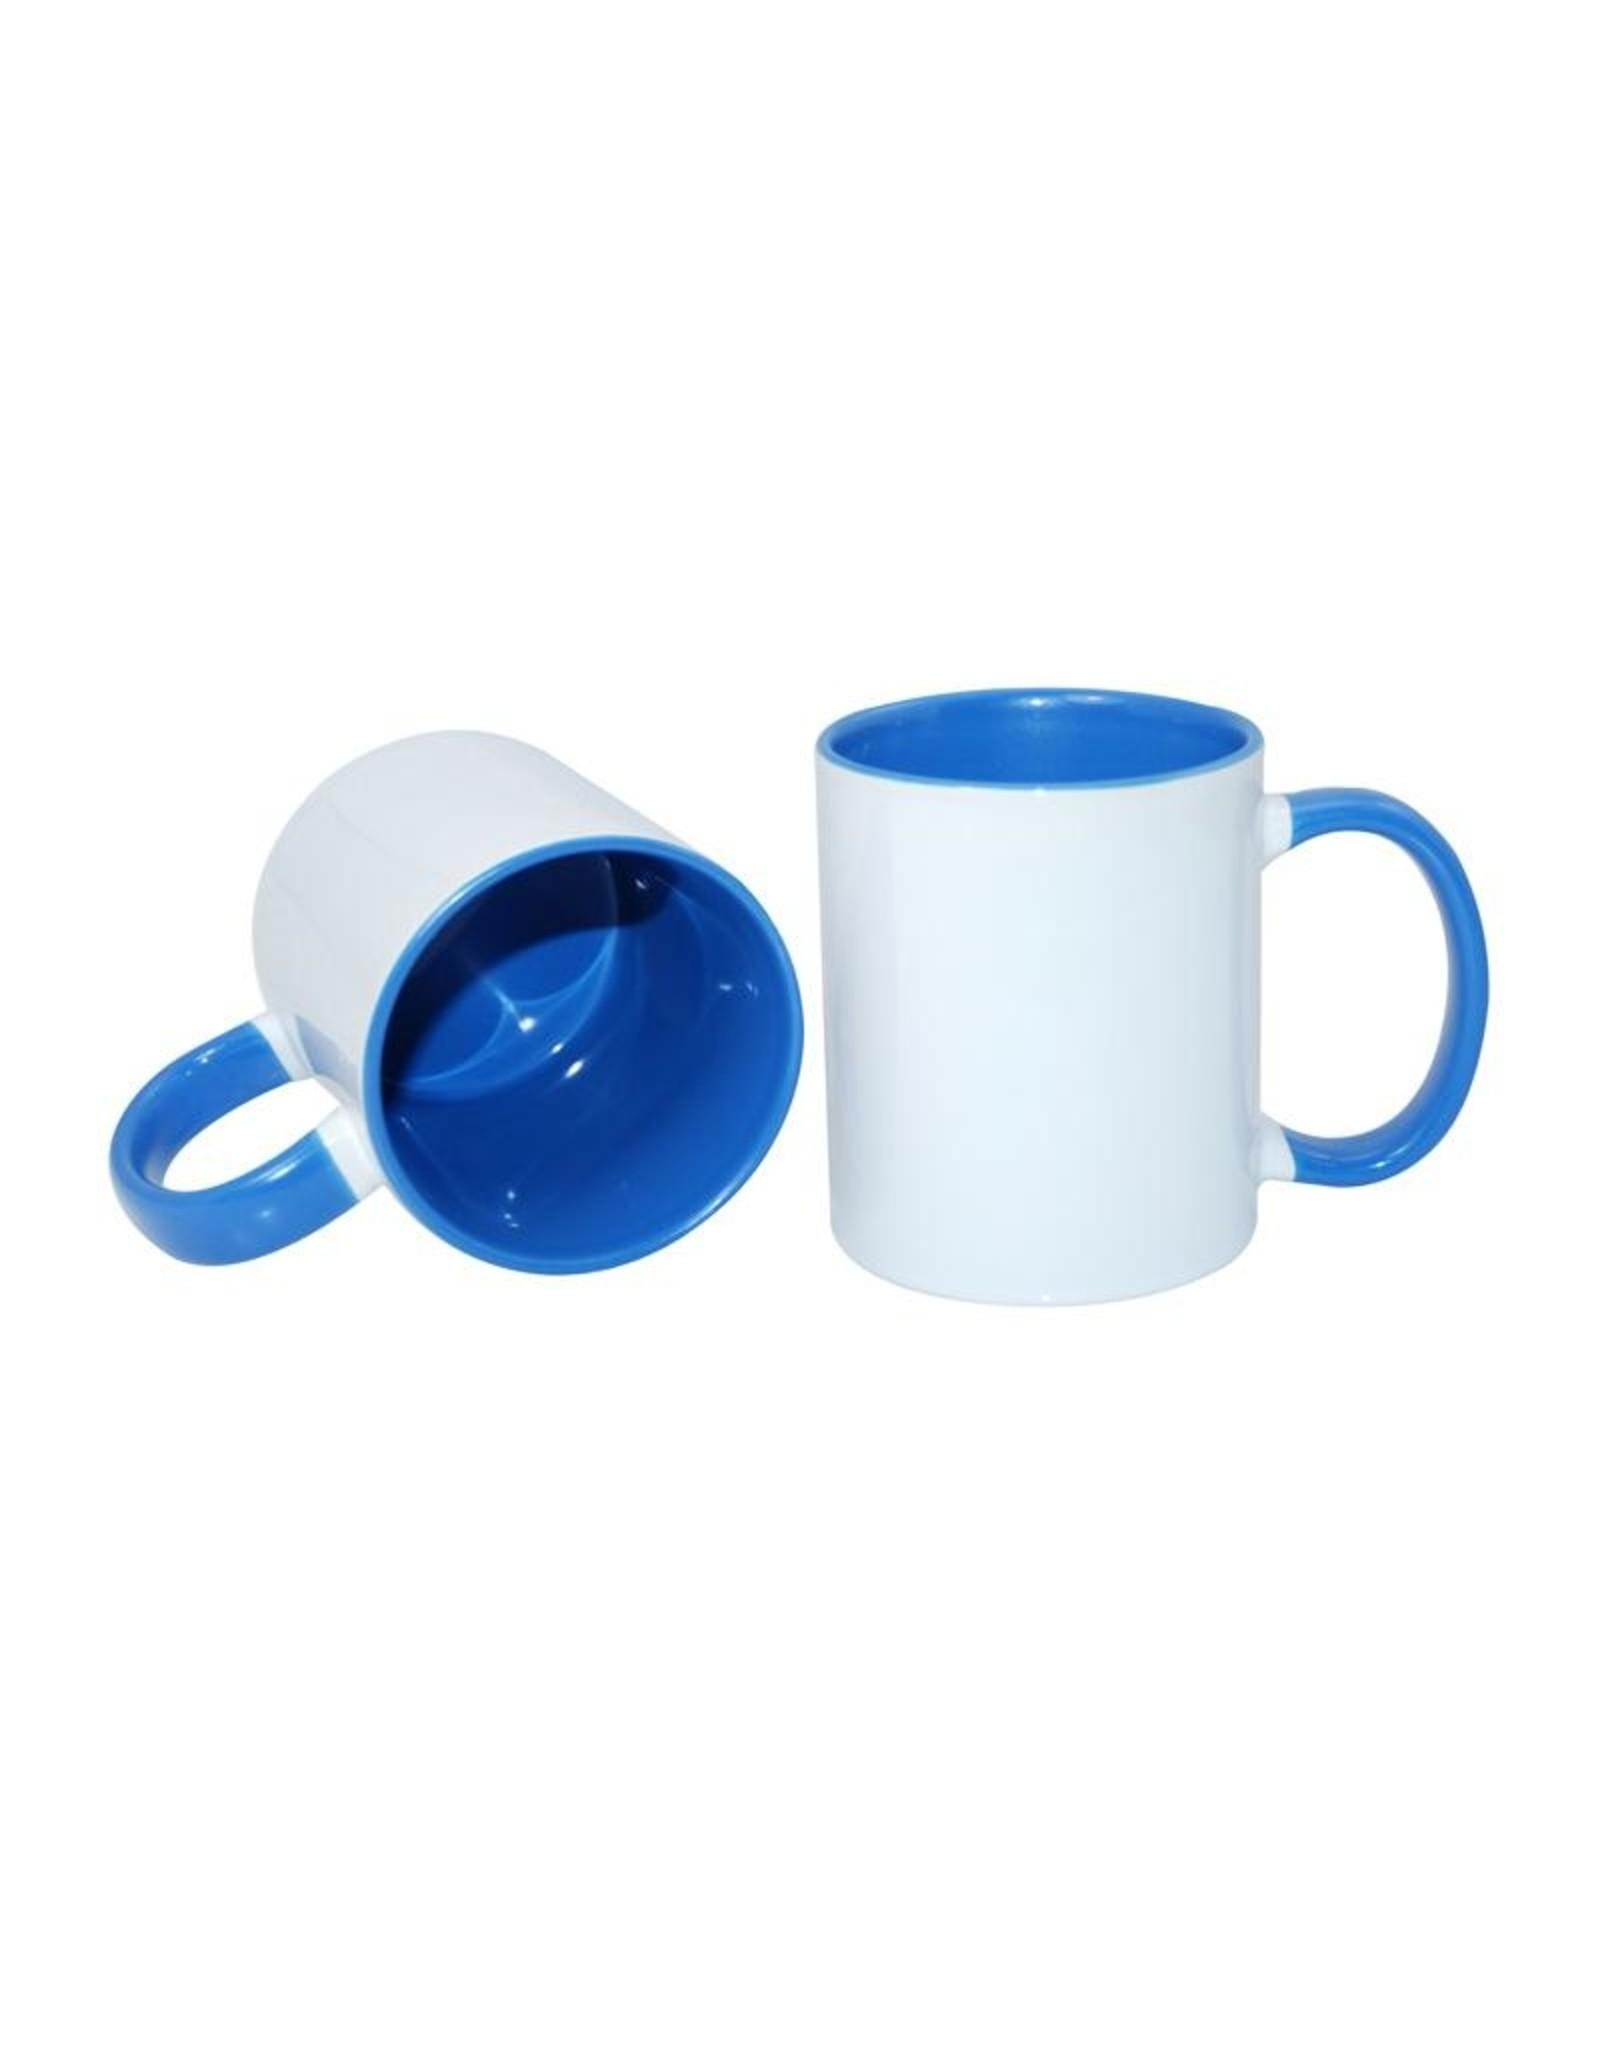 Mok met lichtblauw gekleurde binnenkant en handvat